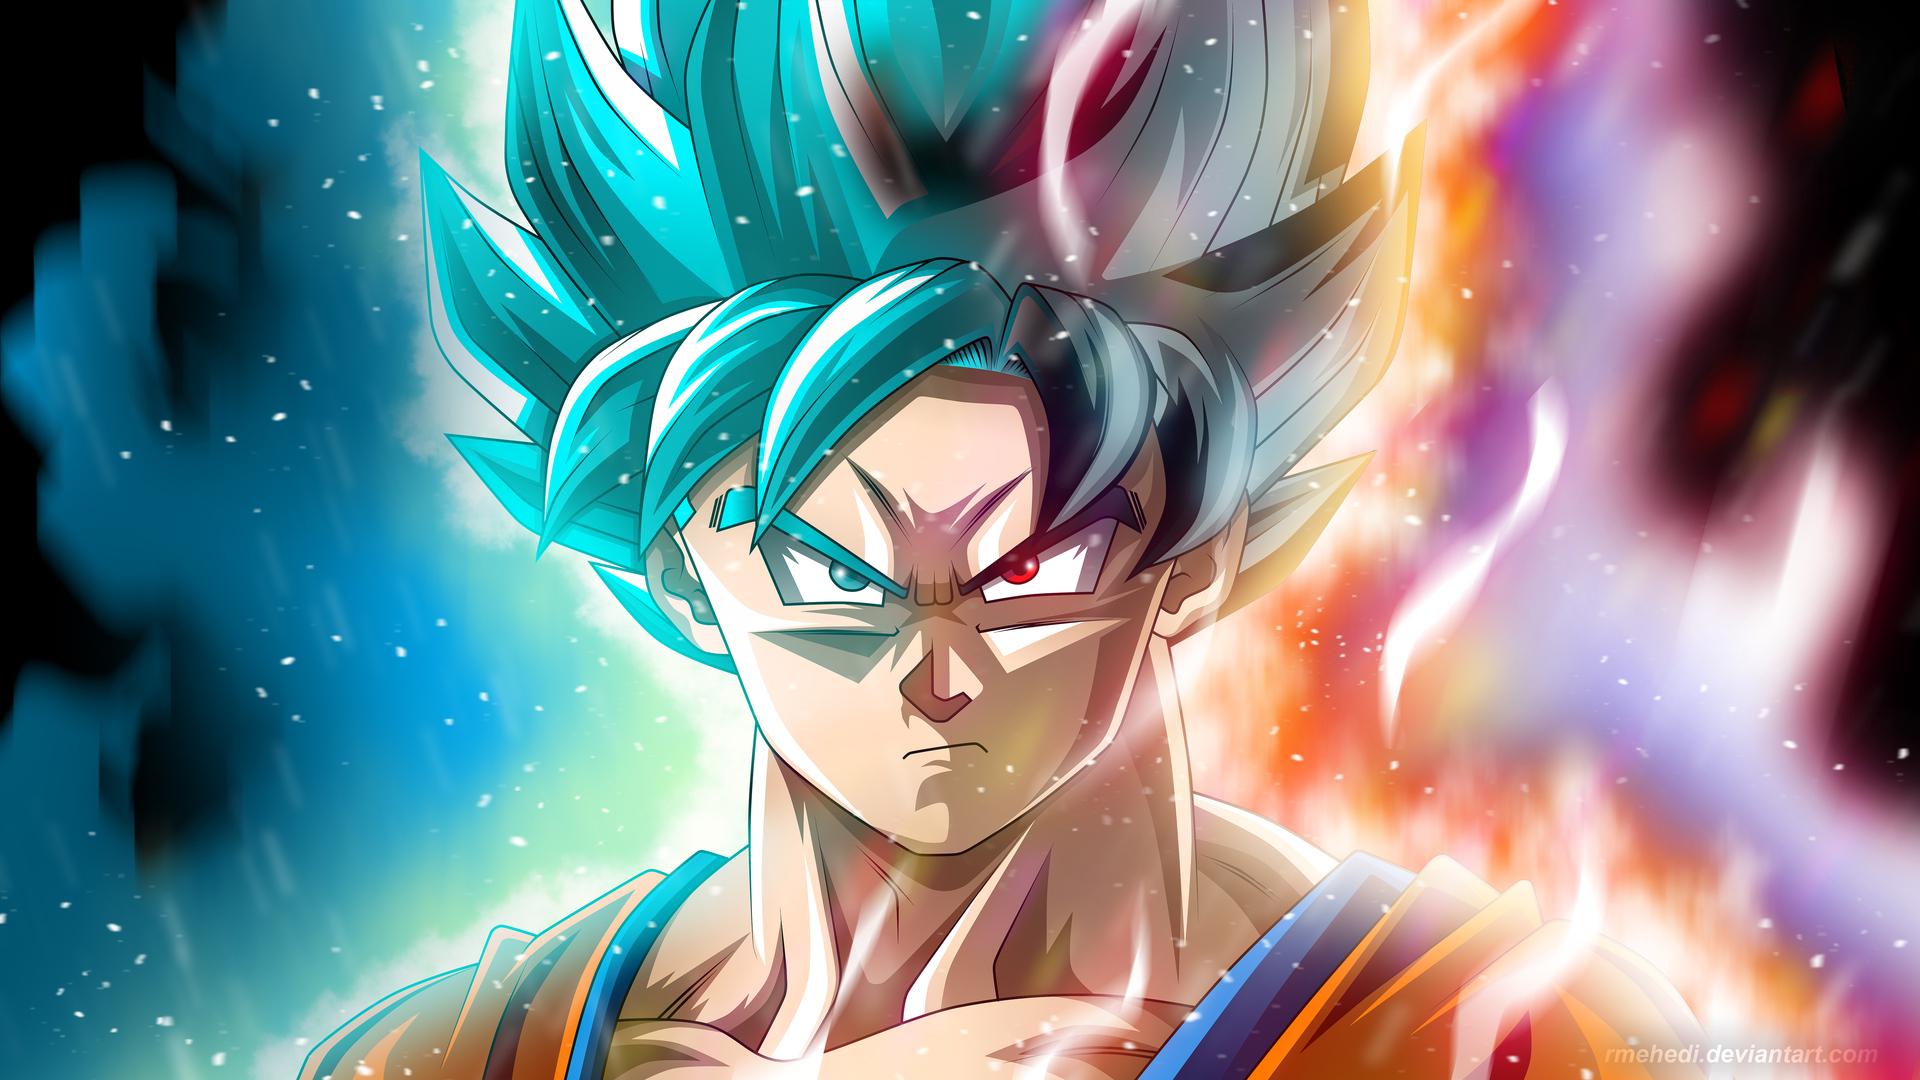 1920x1080 Goku Anime Dragon Ball Super 4k 5k Laptop Full HD 1080P HD 4k Wallpapers, Images ...